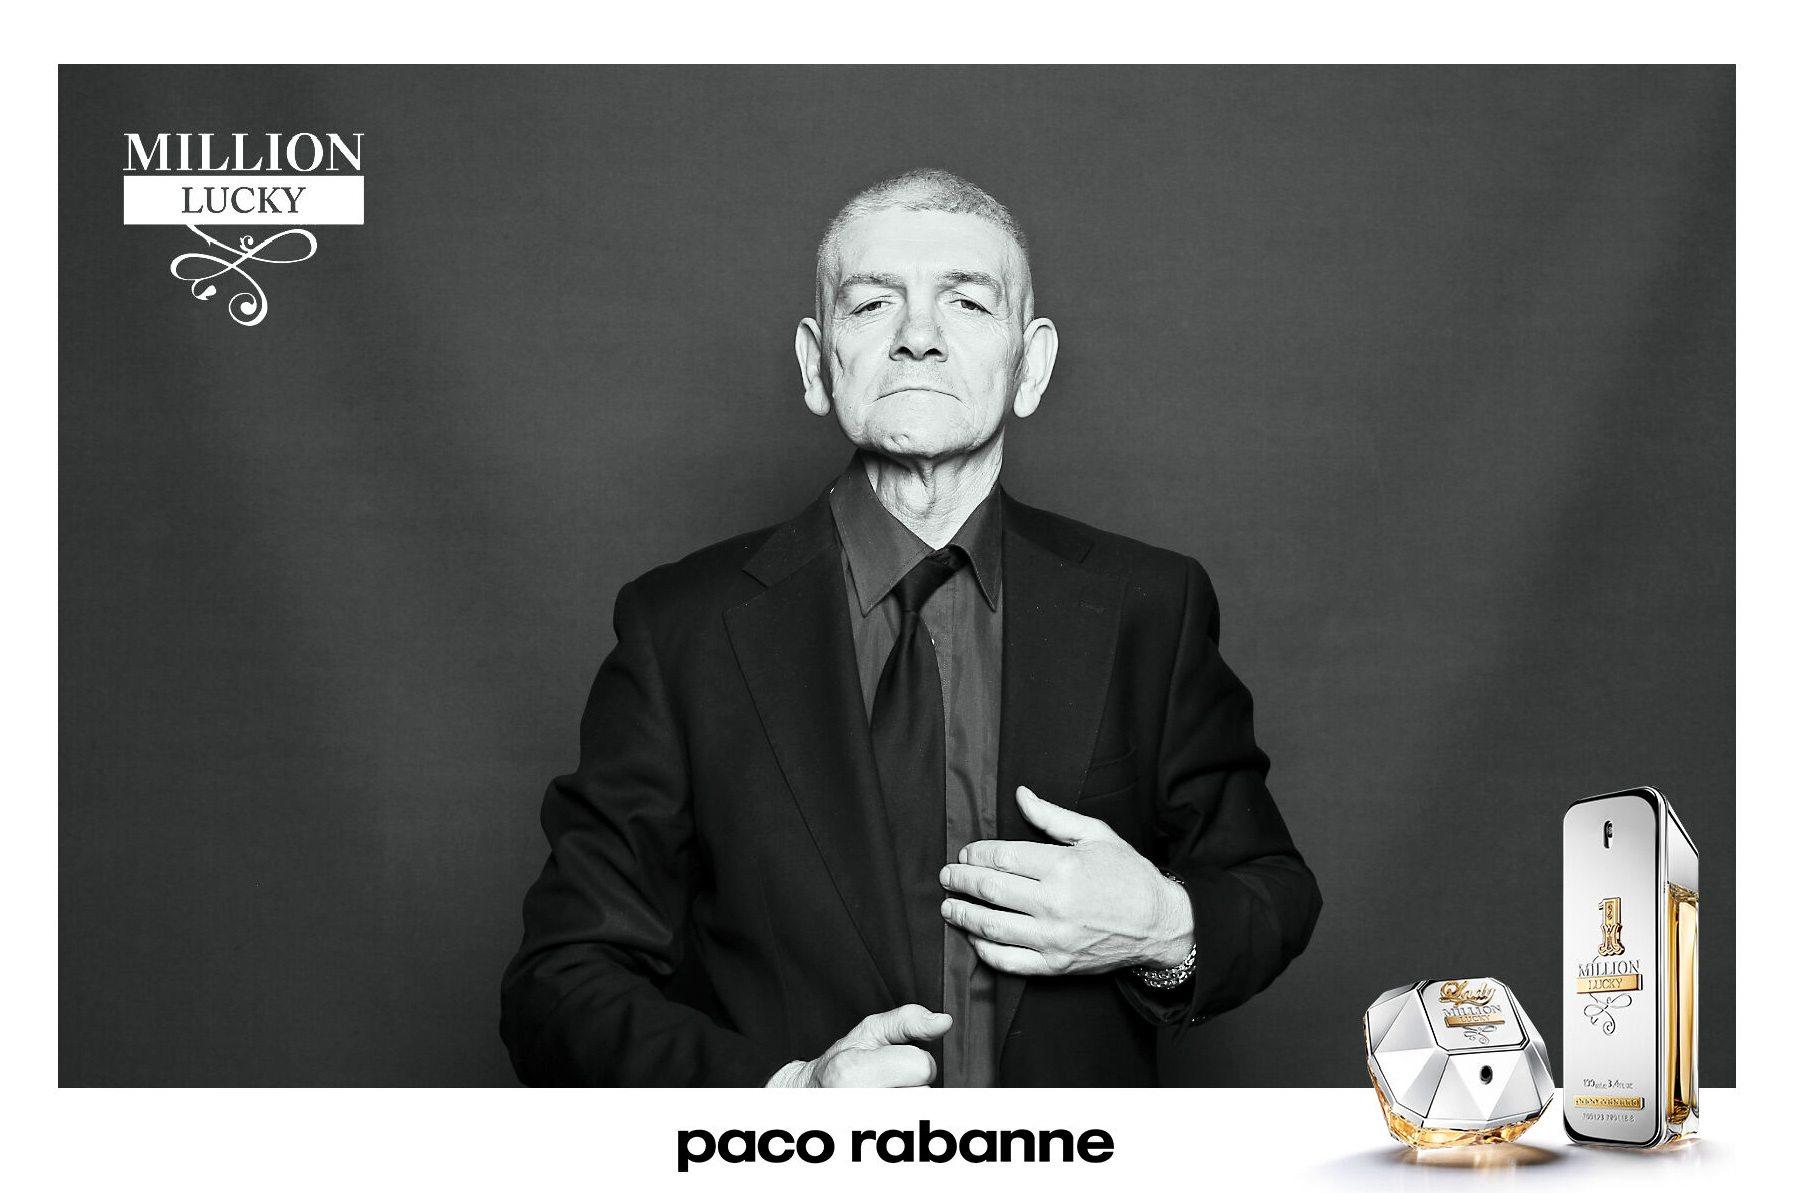 fotokoutek-paco-rabanne-13-4-2018-409279